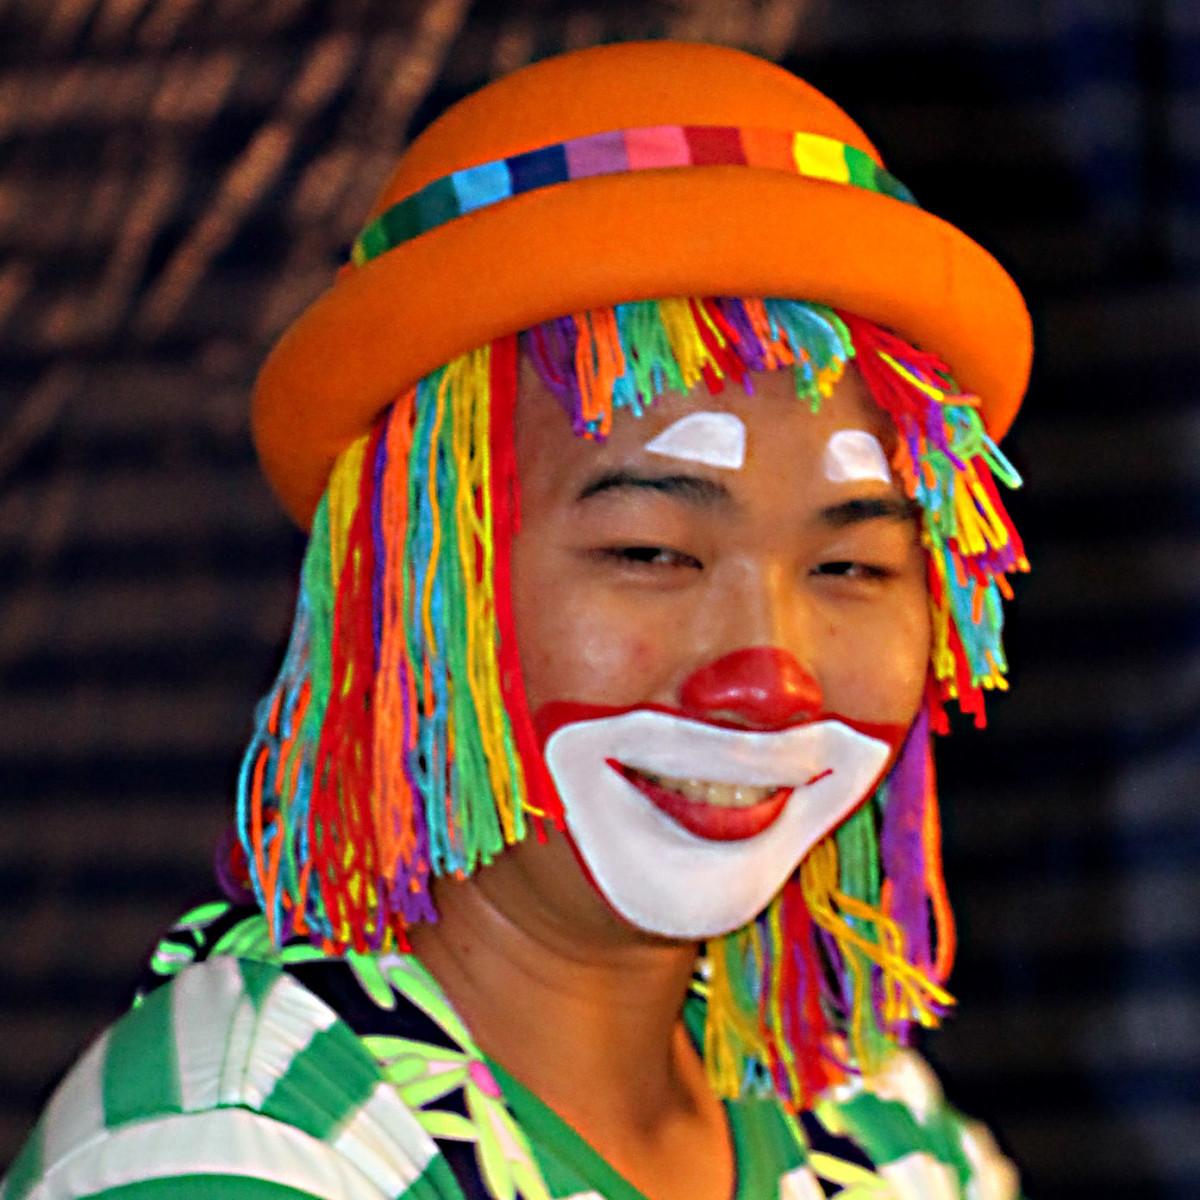 A street entertainer at Asiatique